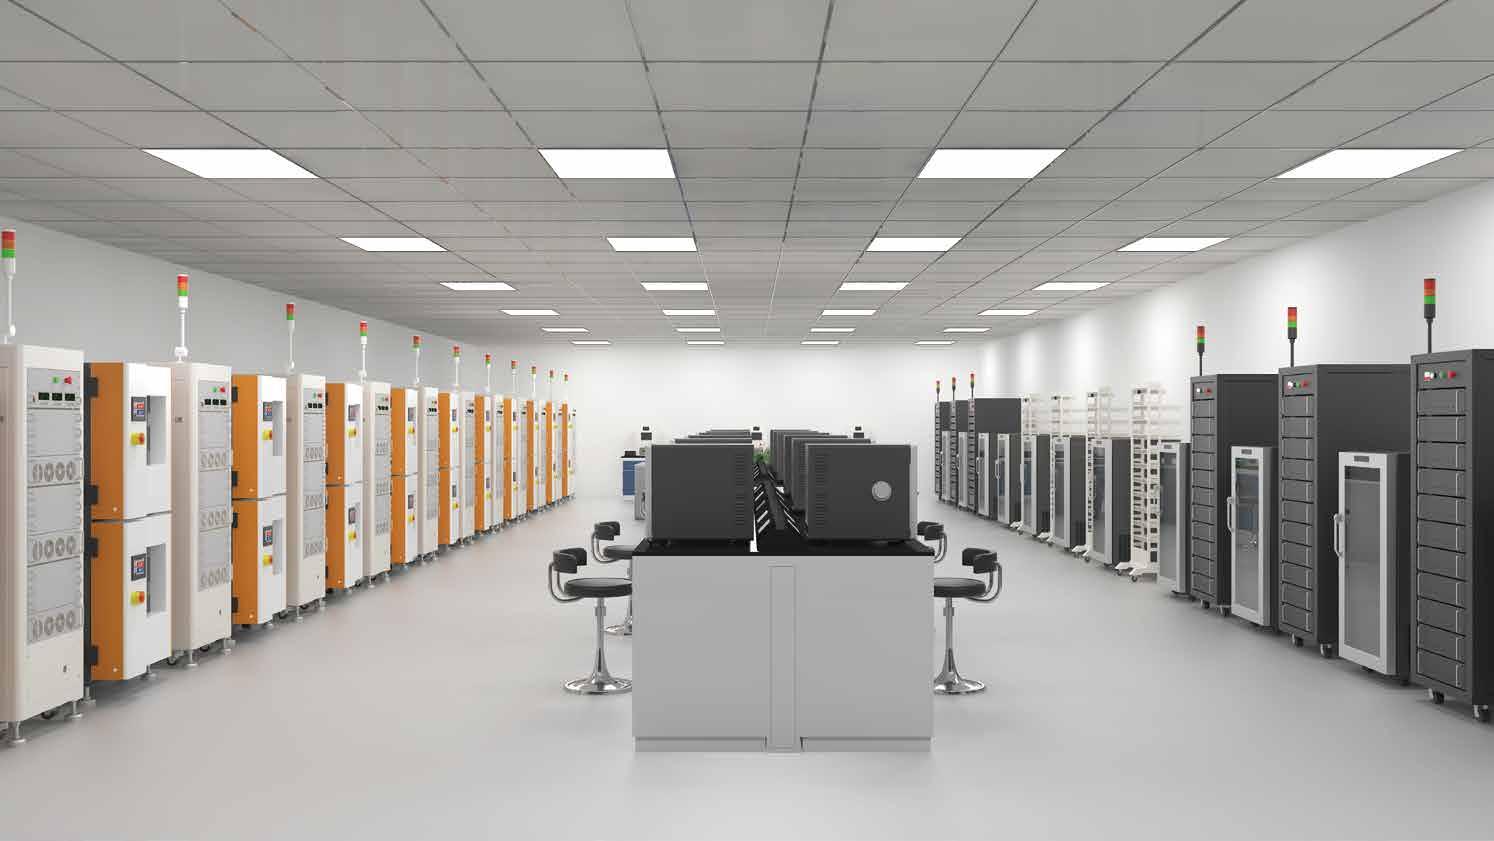 Neware-Environmental-Chamber-Temperature-Tester-Neware-Battery-Testing-System